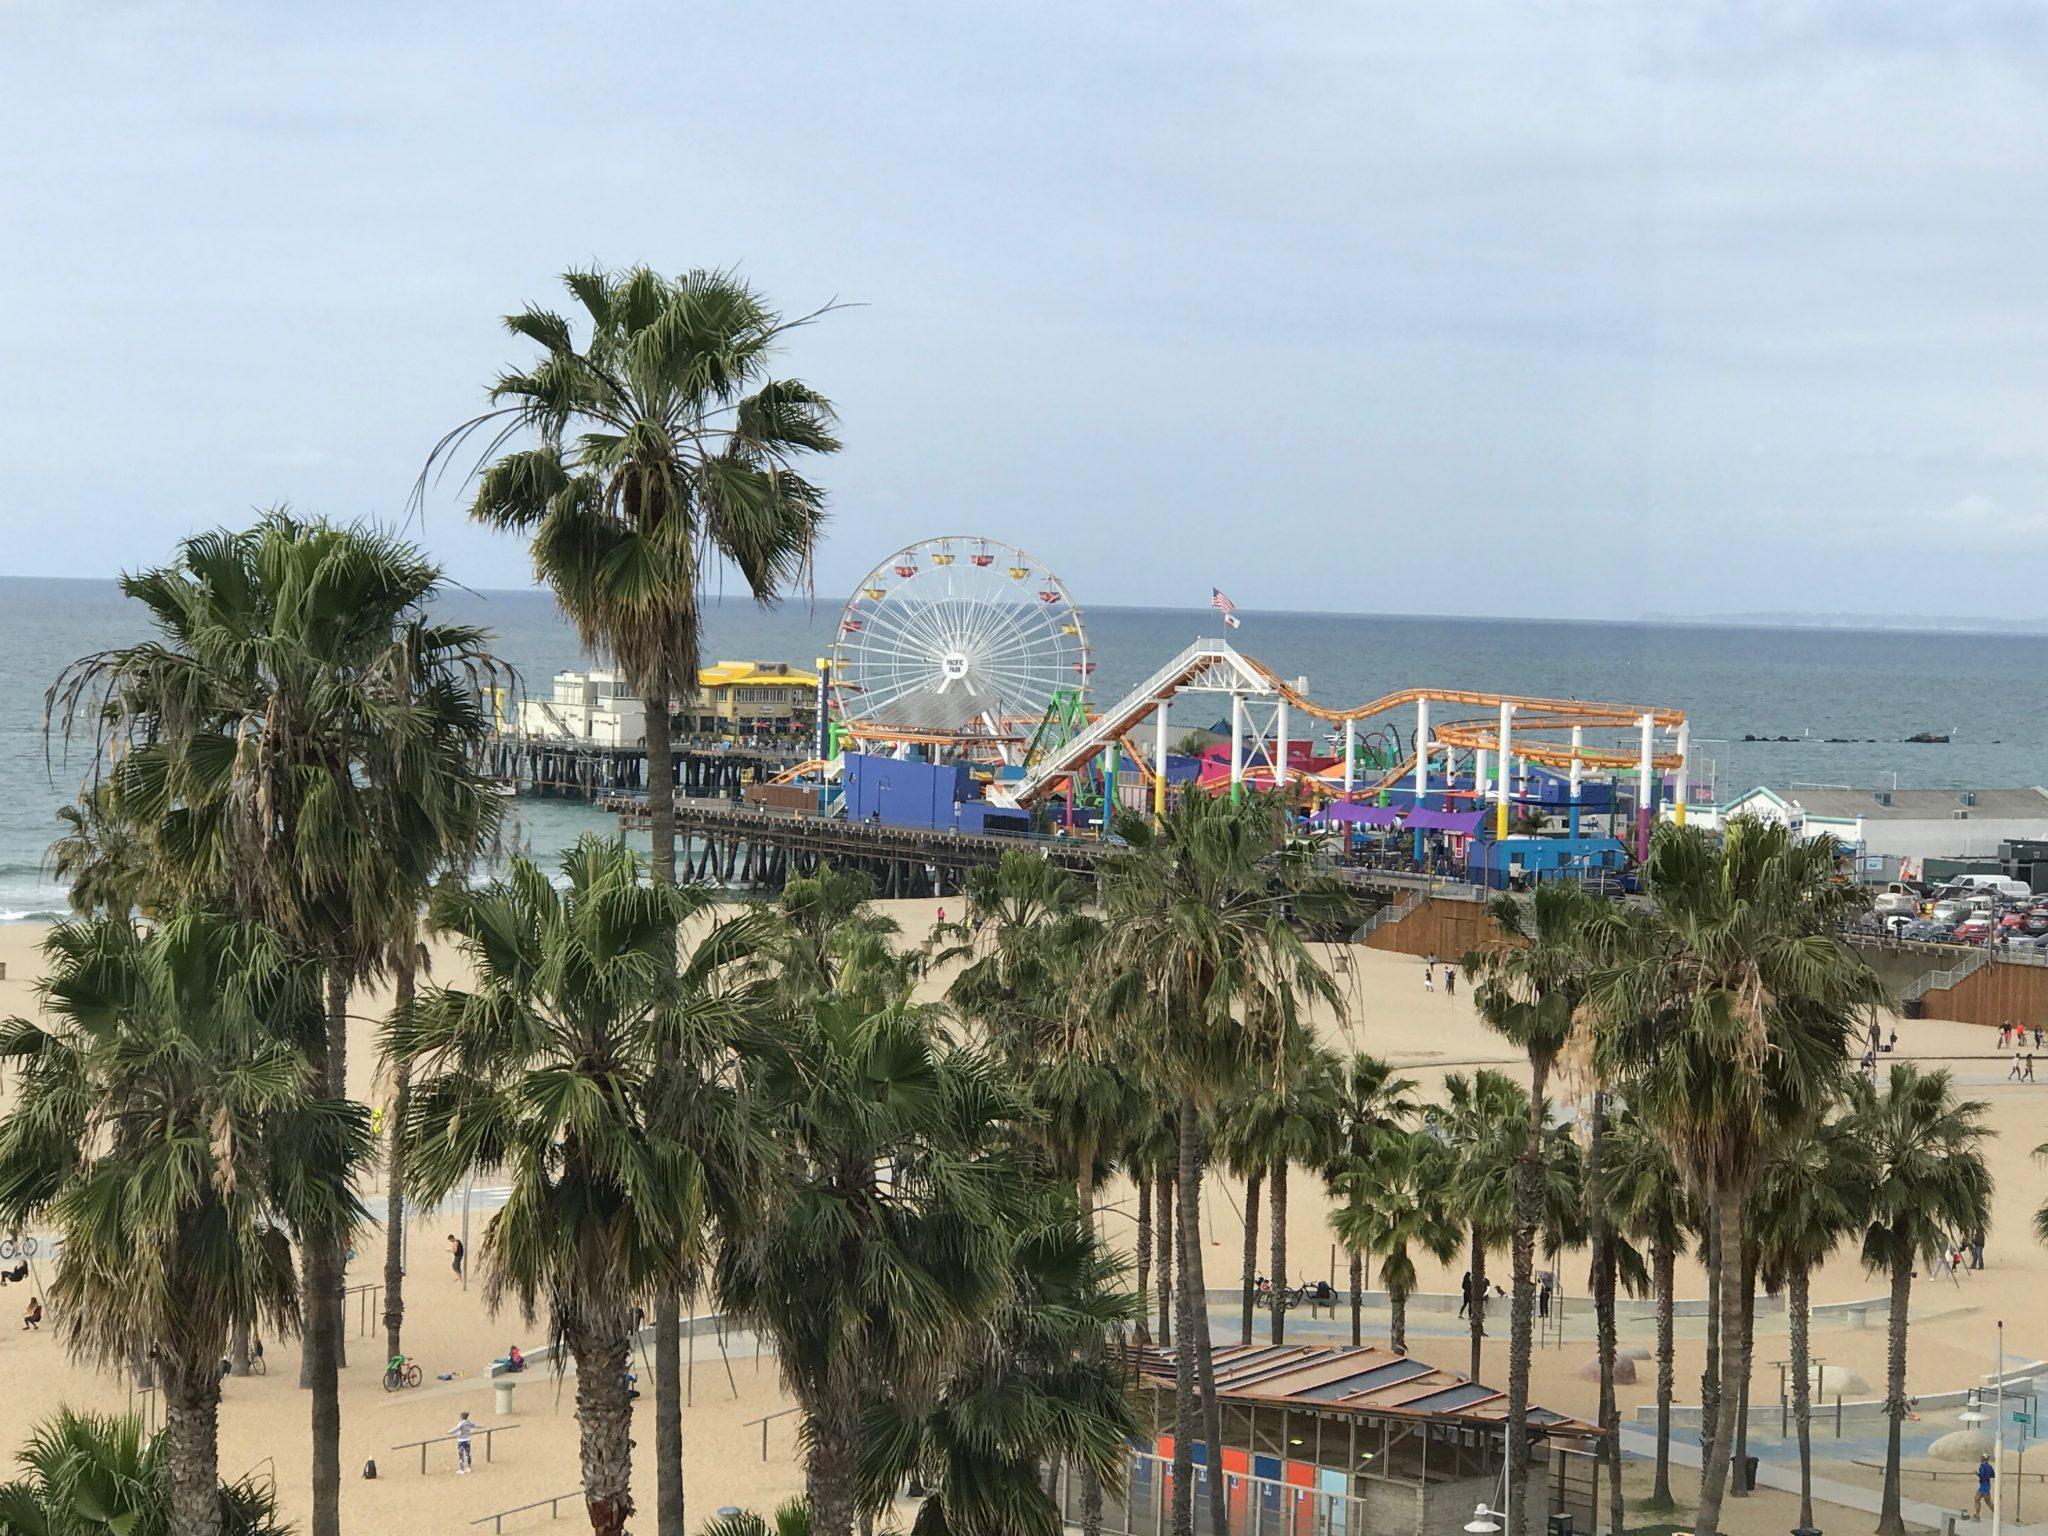 Santa Monica Pier from Loews Hotel view